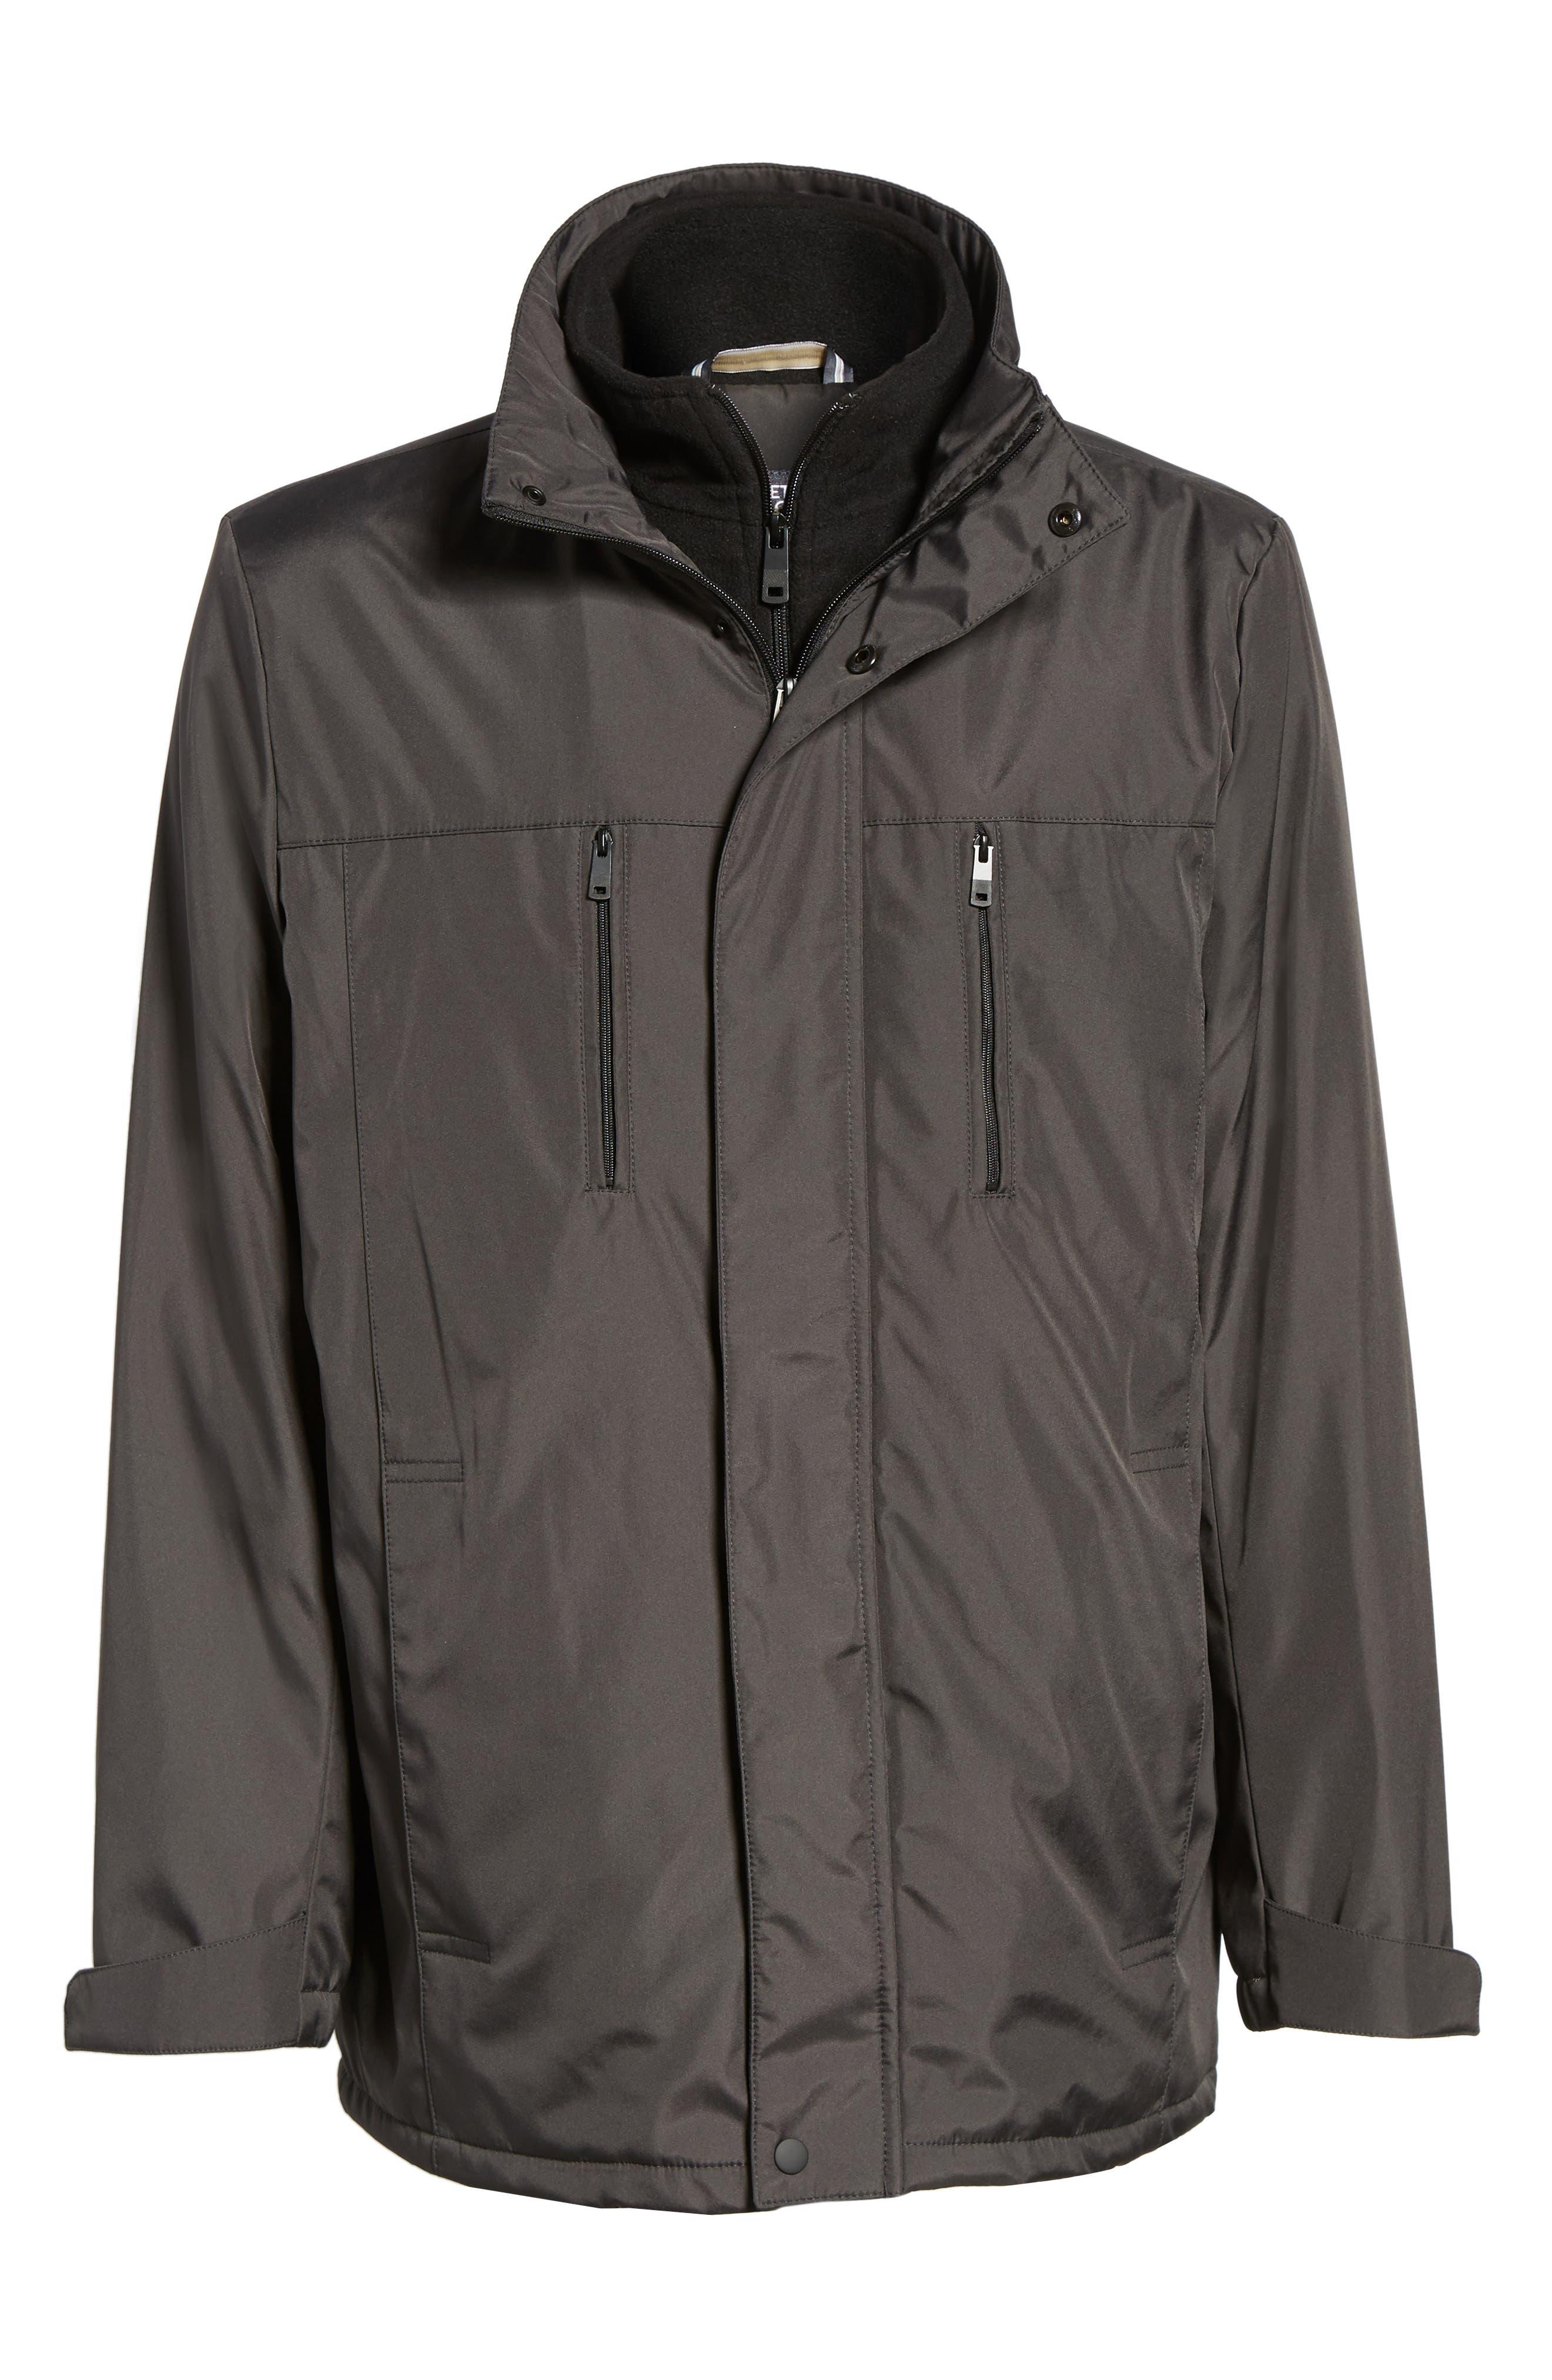 Hooded Jacket with Inset Fleece Bib,                             Alternate thumbnail 18, color,